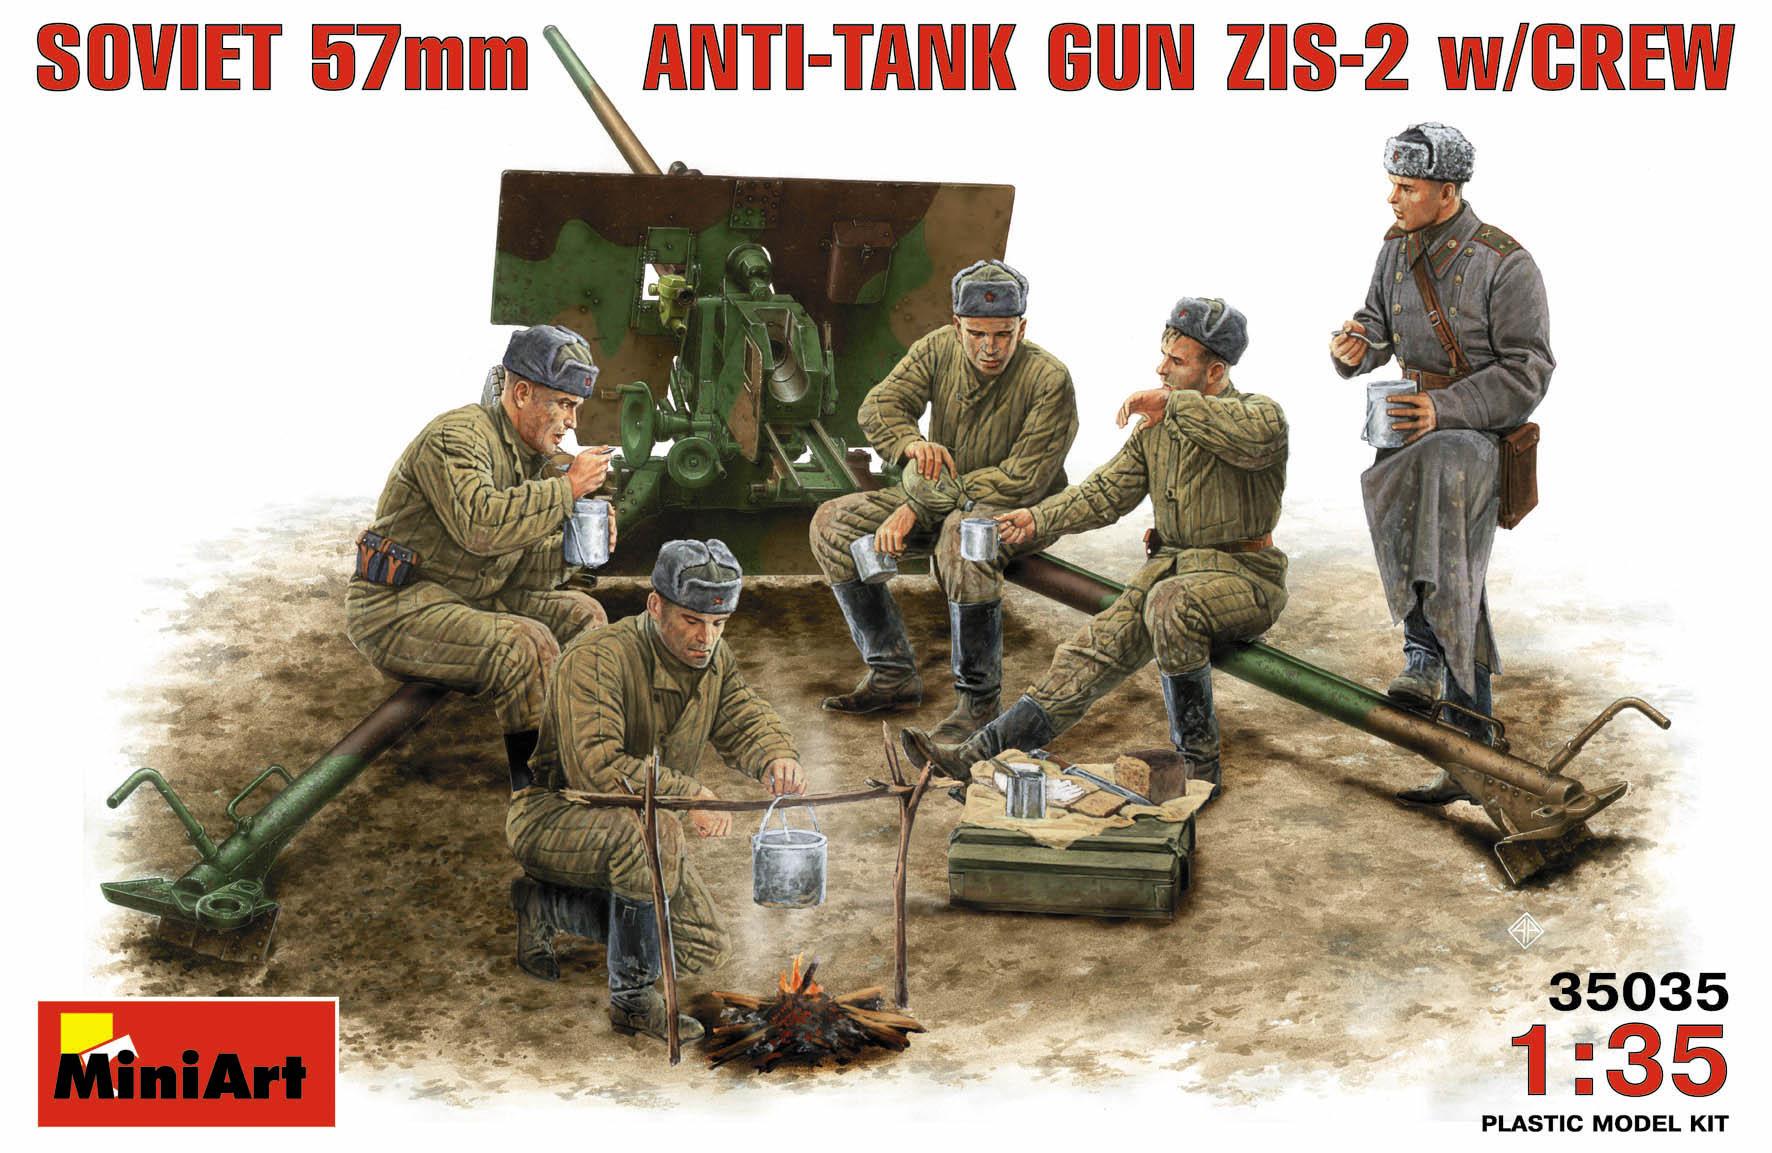 SOVIET 57mm ANTI-TANK GUN ZIS-2 w/CREW